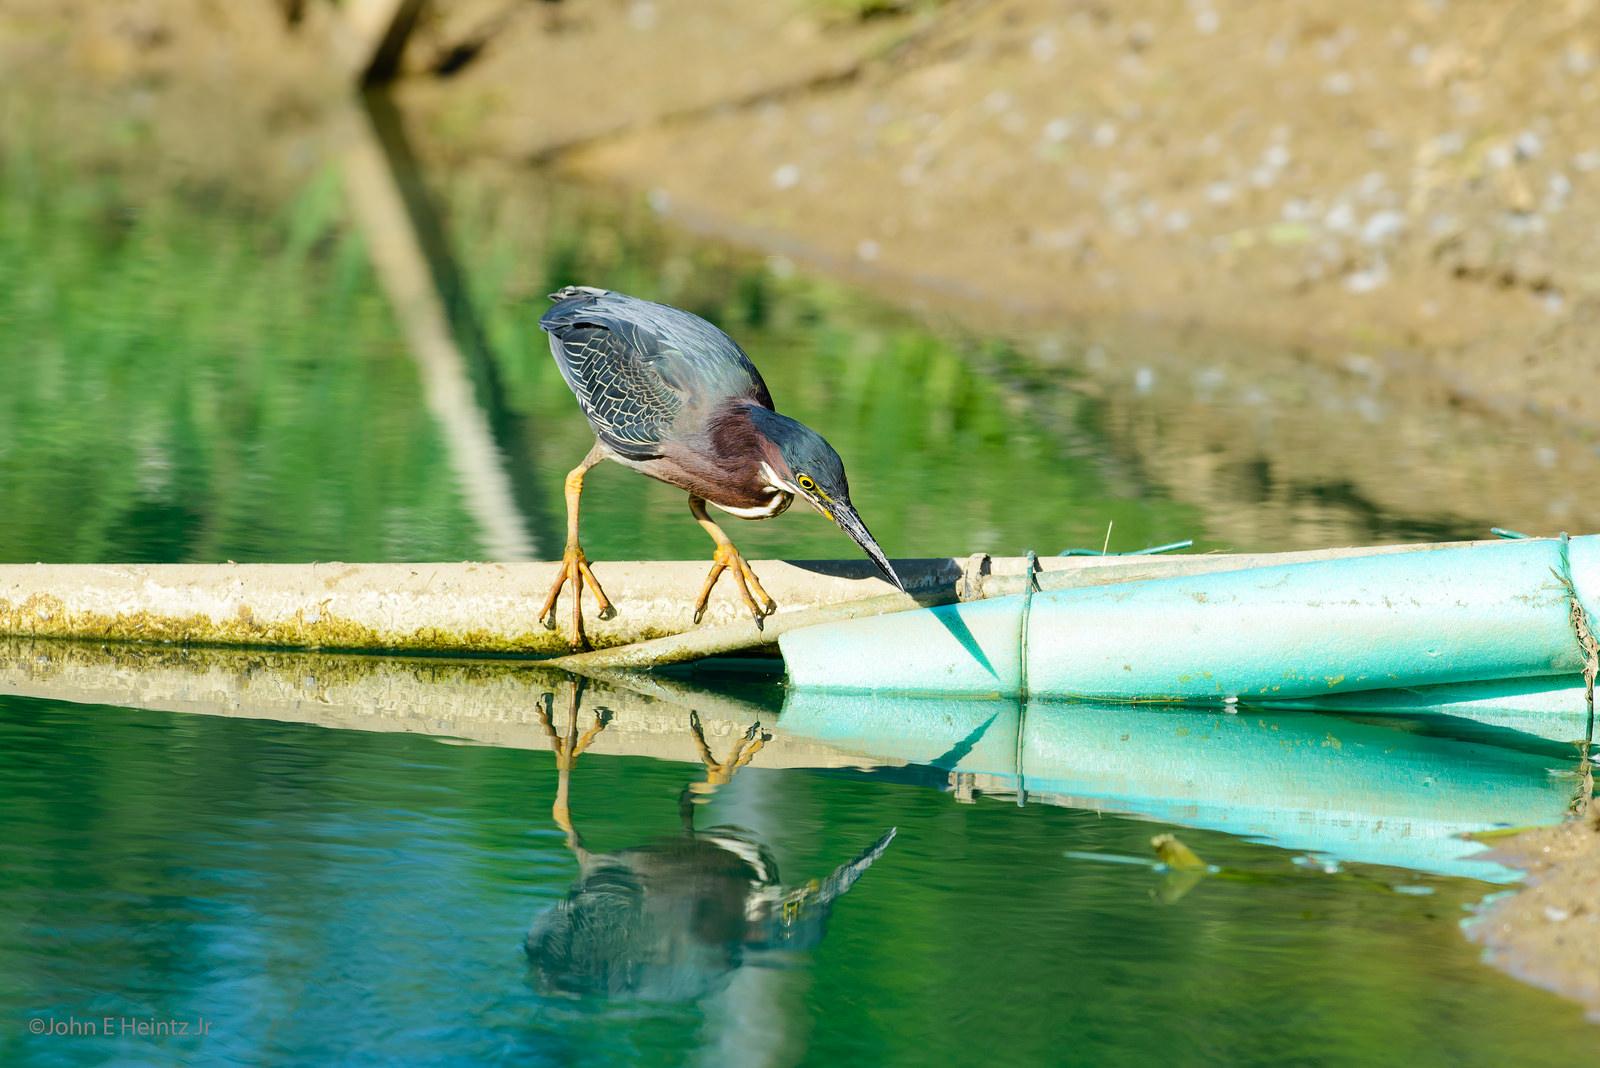 Green Heron and Frog by John Heintz